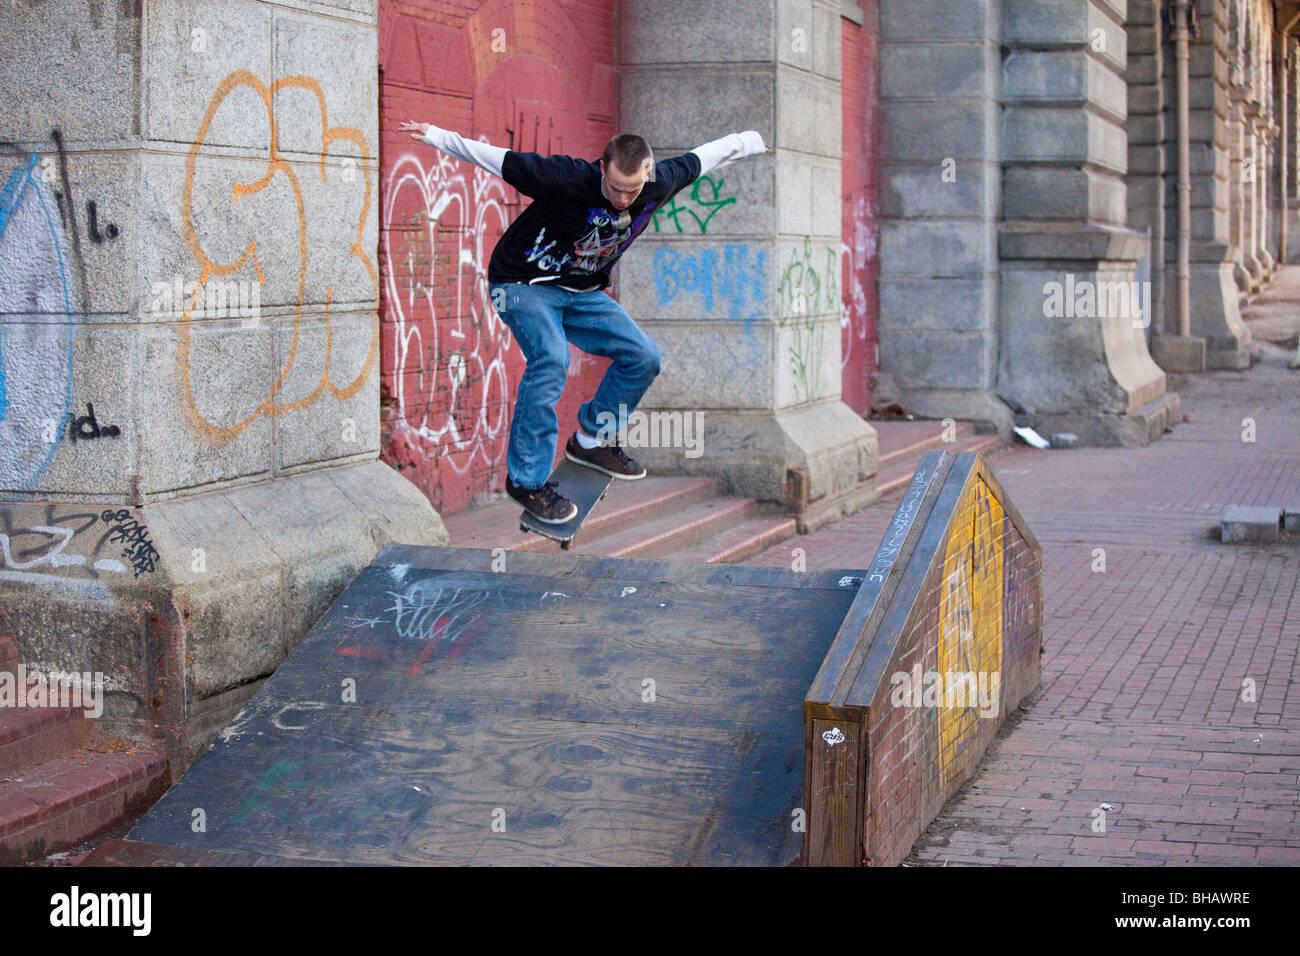 Teen facendo trucchi skateboard a Manhattan, New York City Immagini Stock